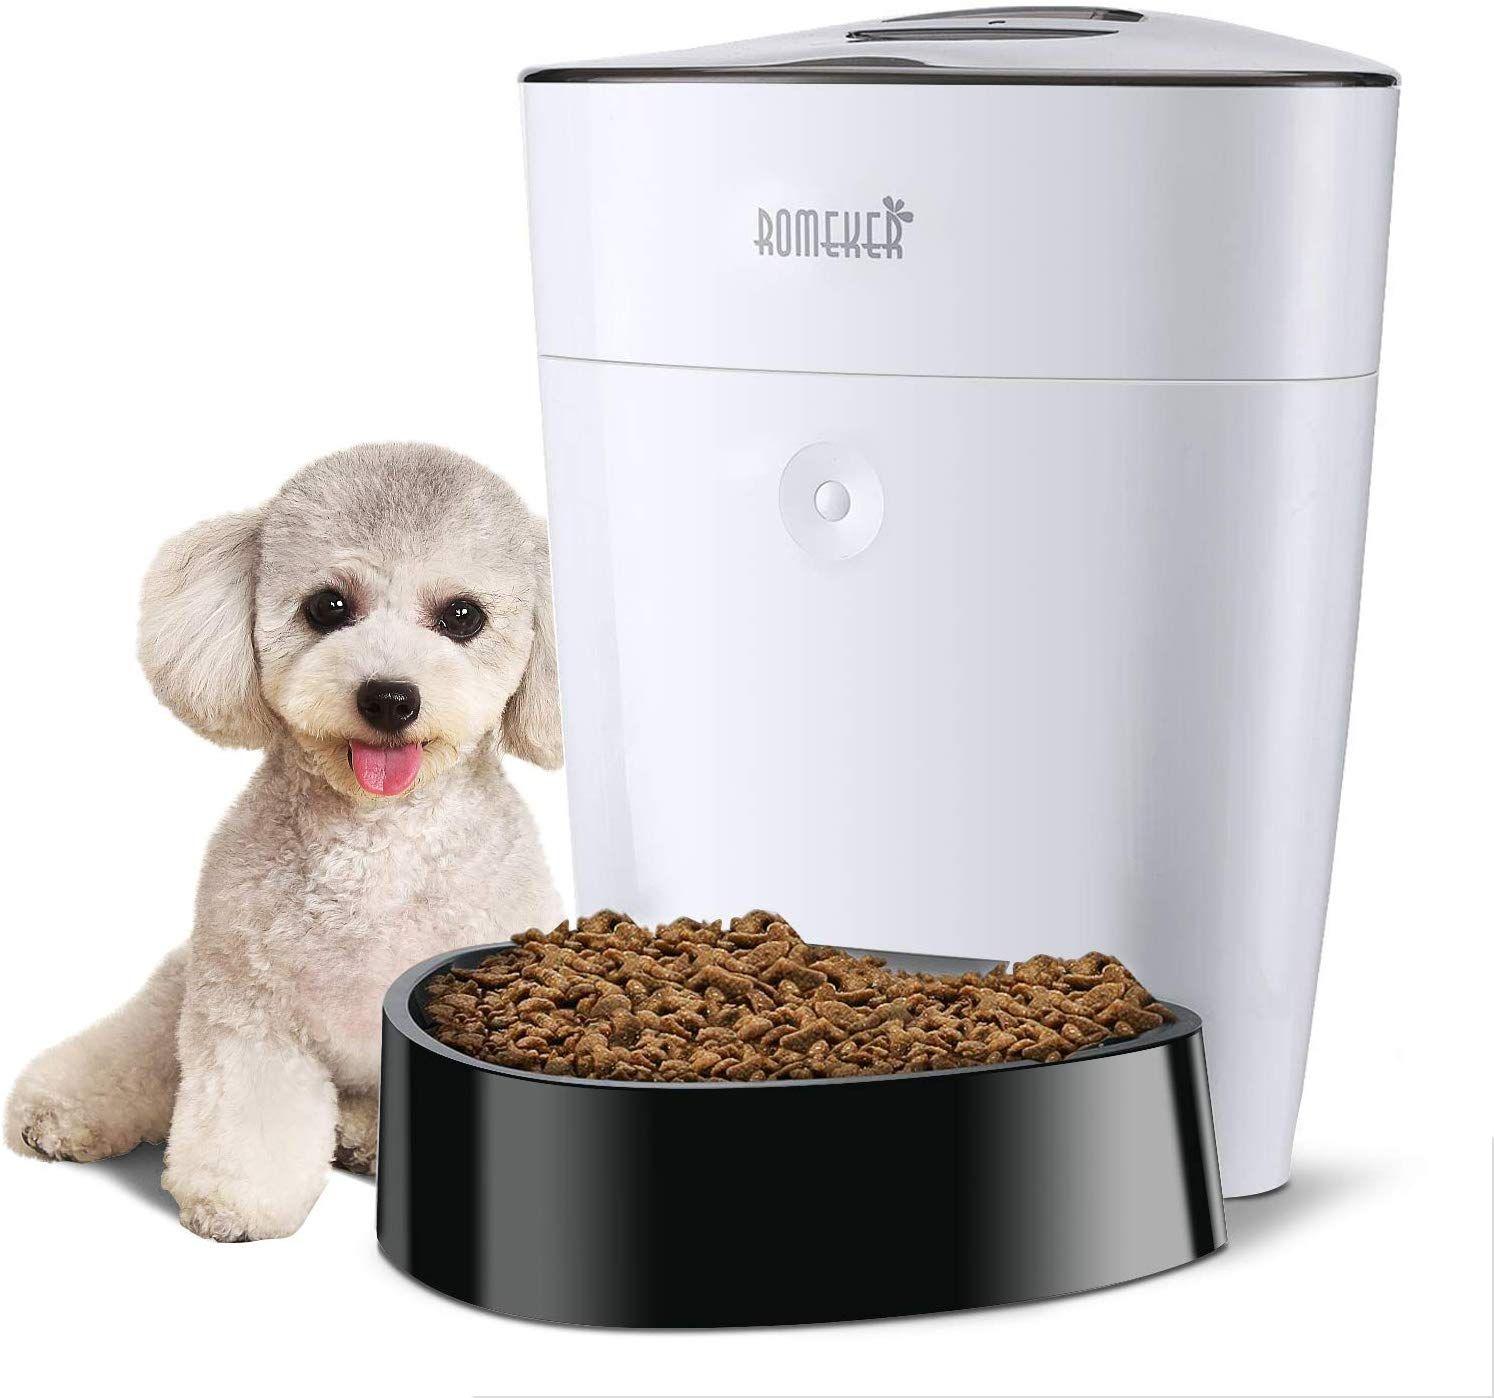 ROMEKER Automatic Cat Feeder 4L Smart Pet Feeder Auto Dog